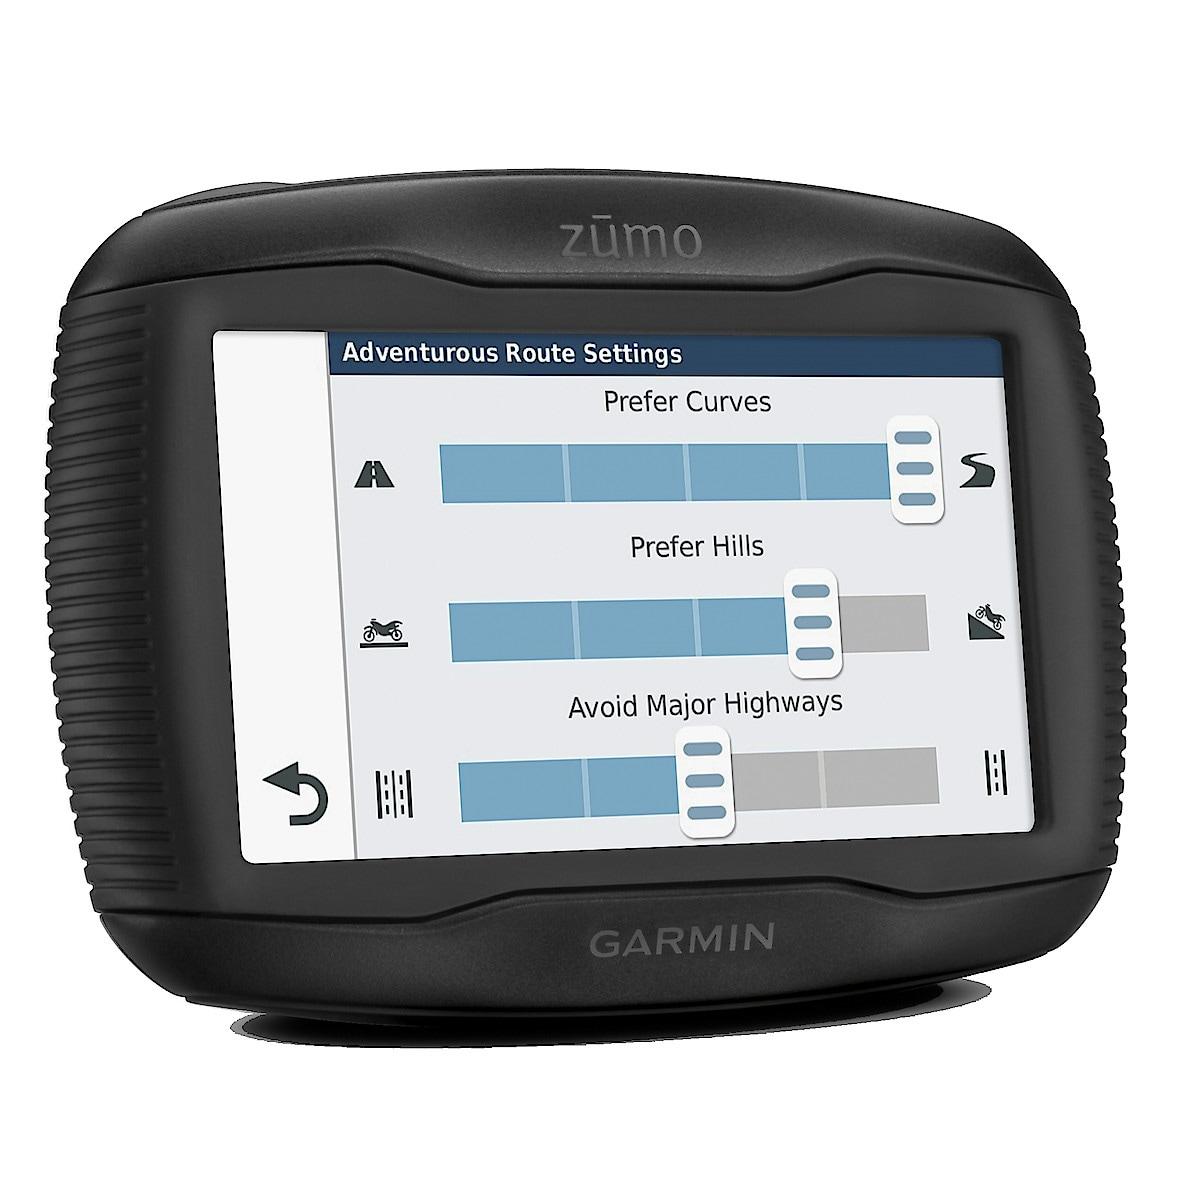 Navigator för MC Garmin Zumo 395LM